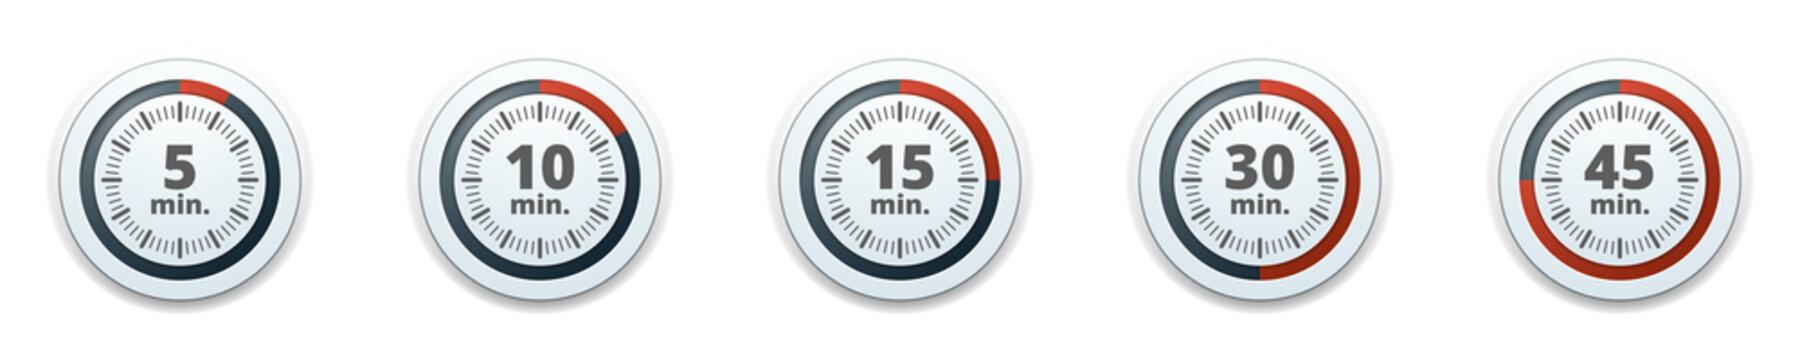 Minutes Time button illustration